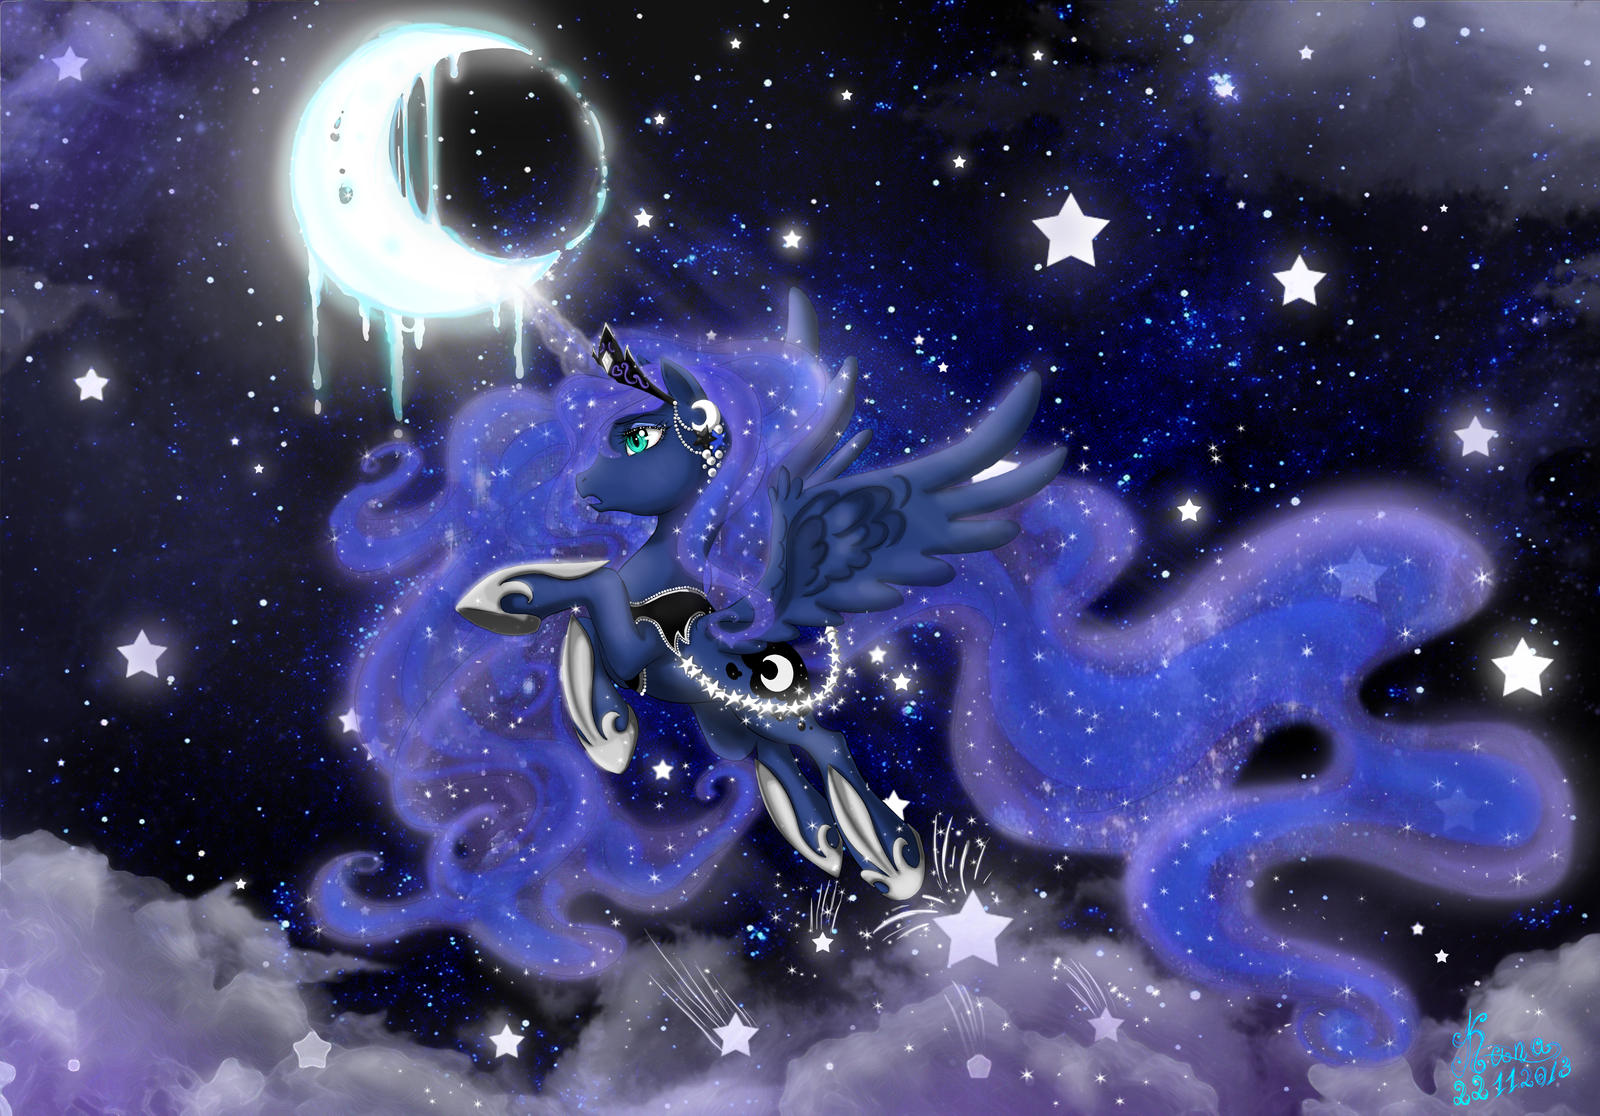 My Little Pony Friendship Is Magic Princess Luna by Kanochka on